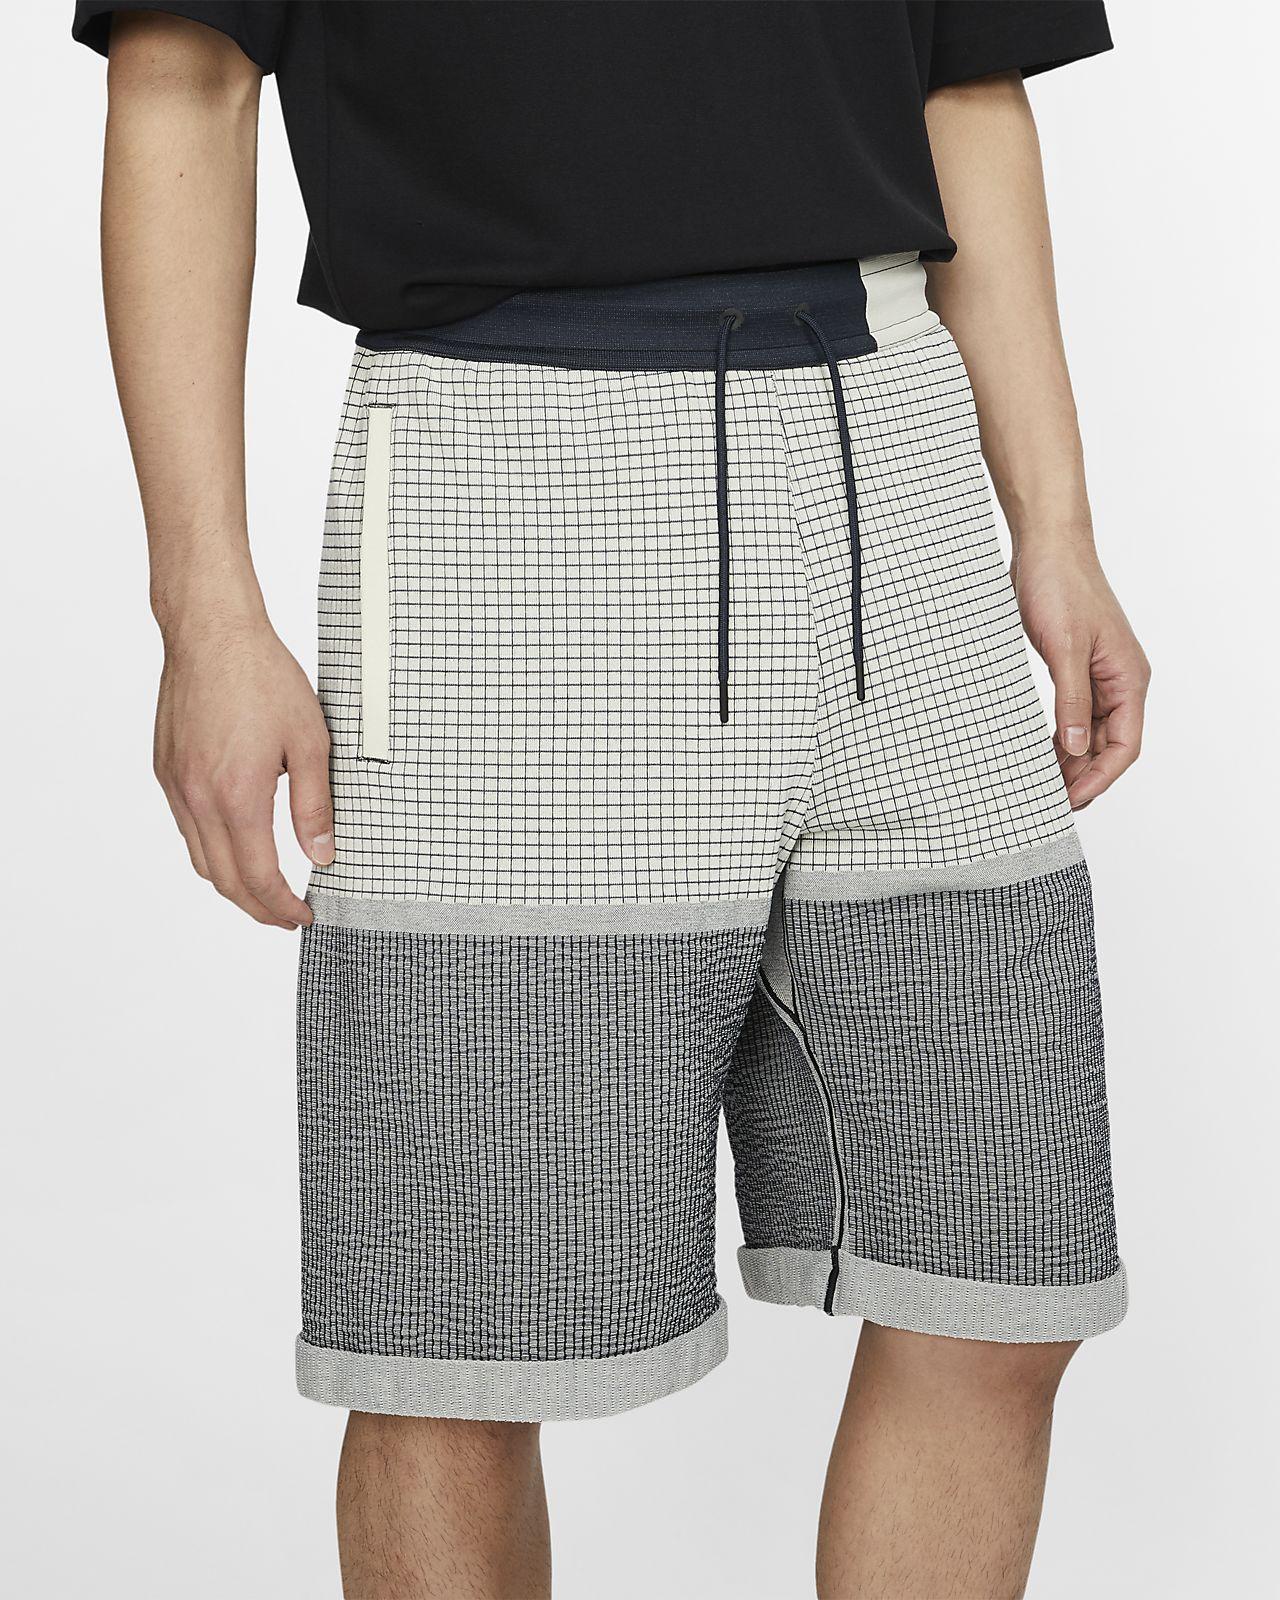 3280464a09d Nike Sportswear Tech Pack Knit herenshorts. Nike.com BE